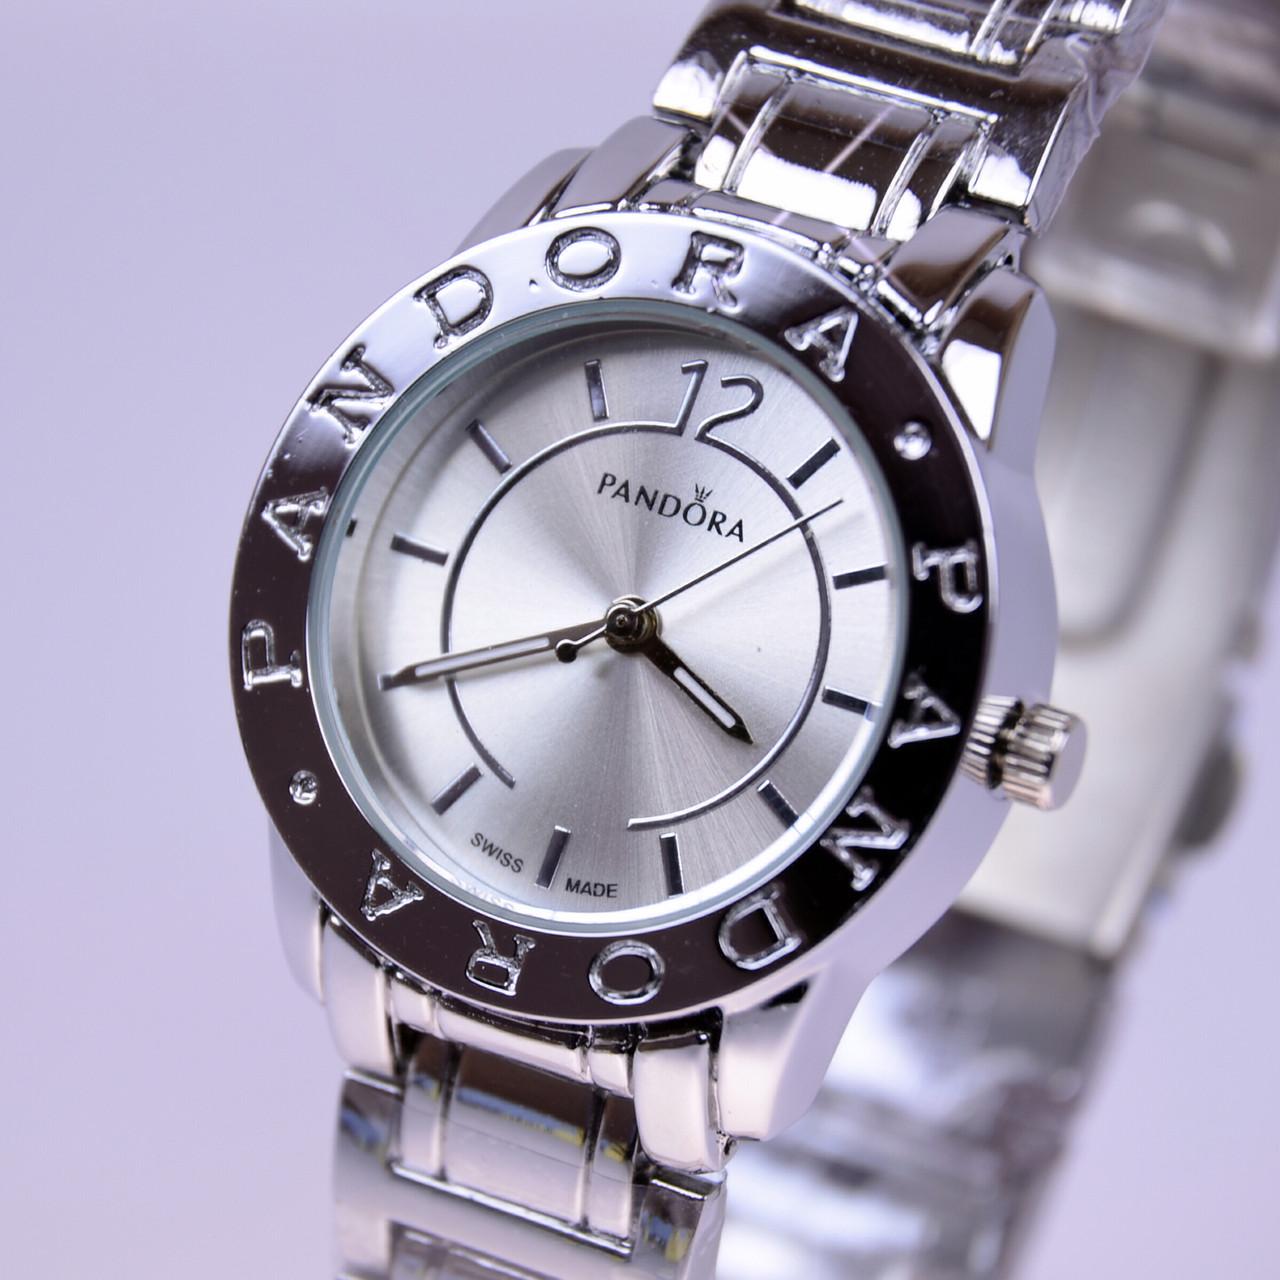 b10b4710 Женские наручные часы PANDORA (Пандора) Silver 32 мм: продажа, цена ...